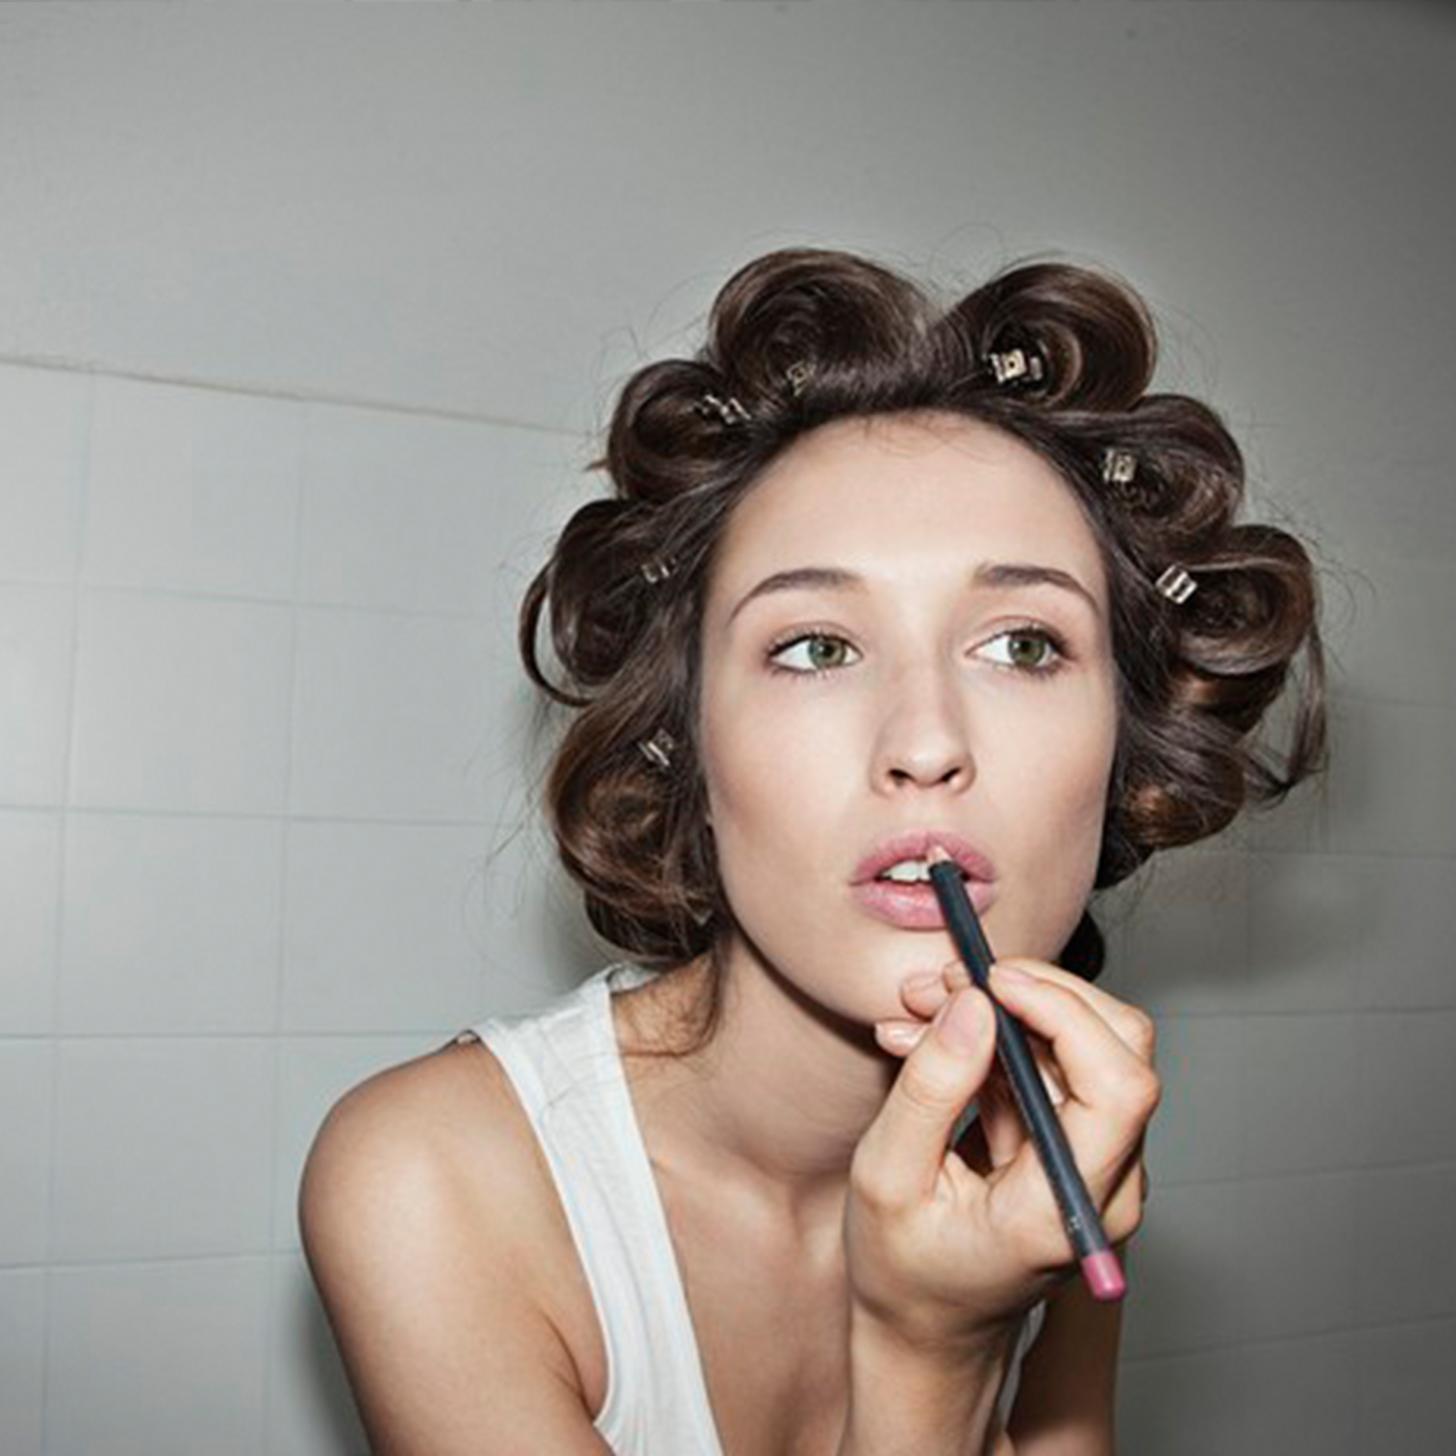 Beauty Hack Makeup: Best Party Beauty Hacks